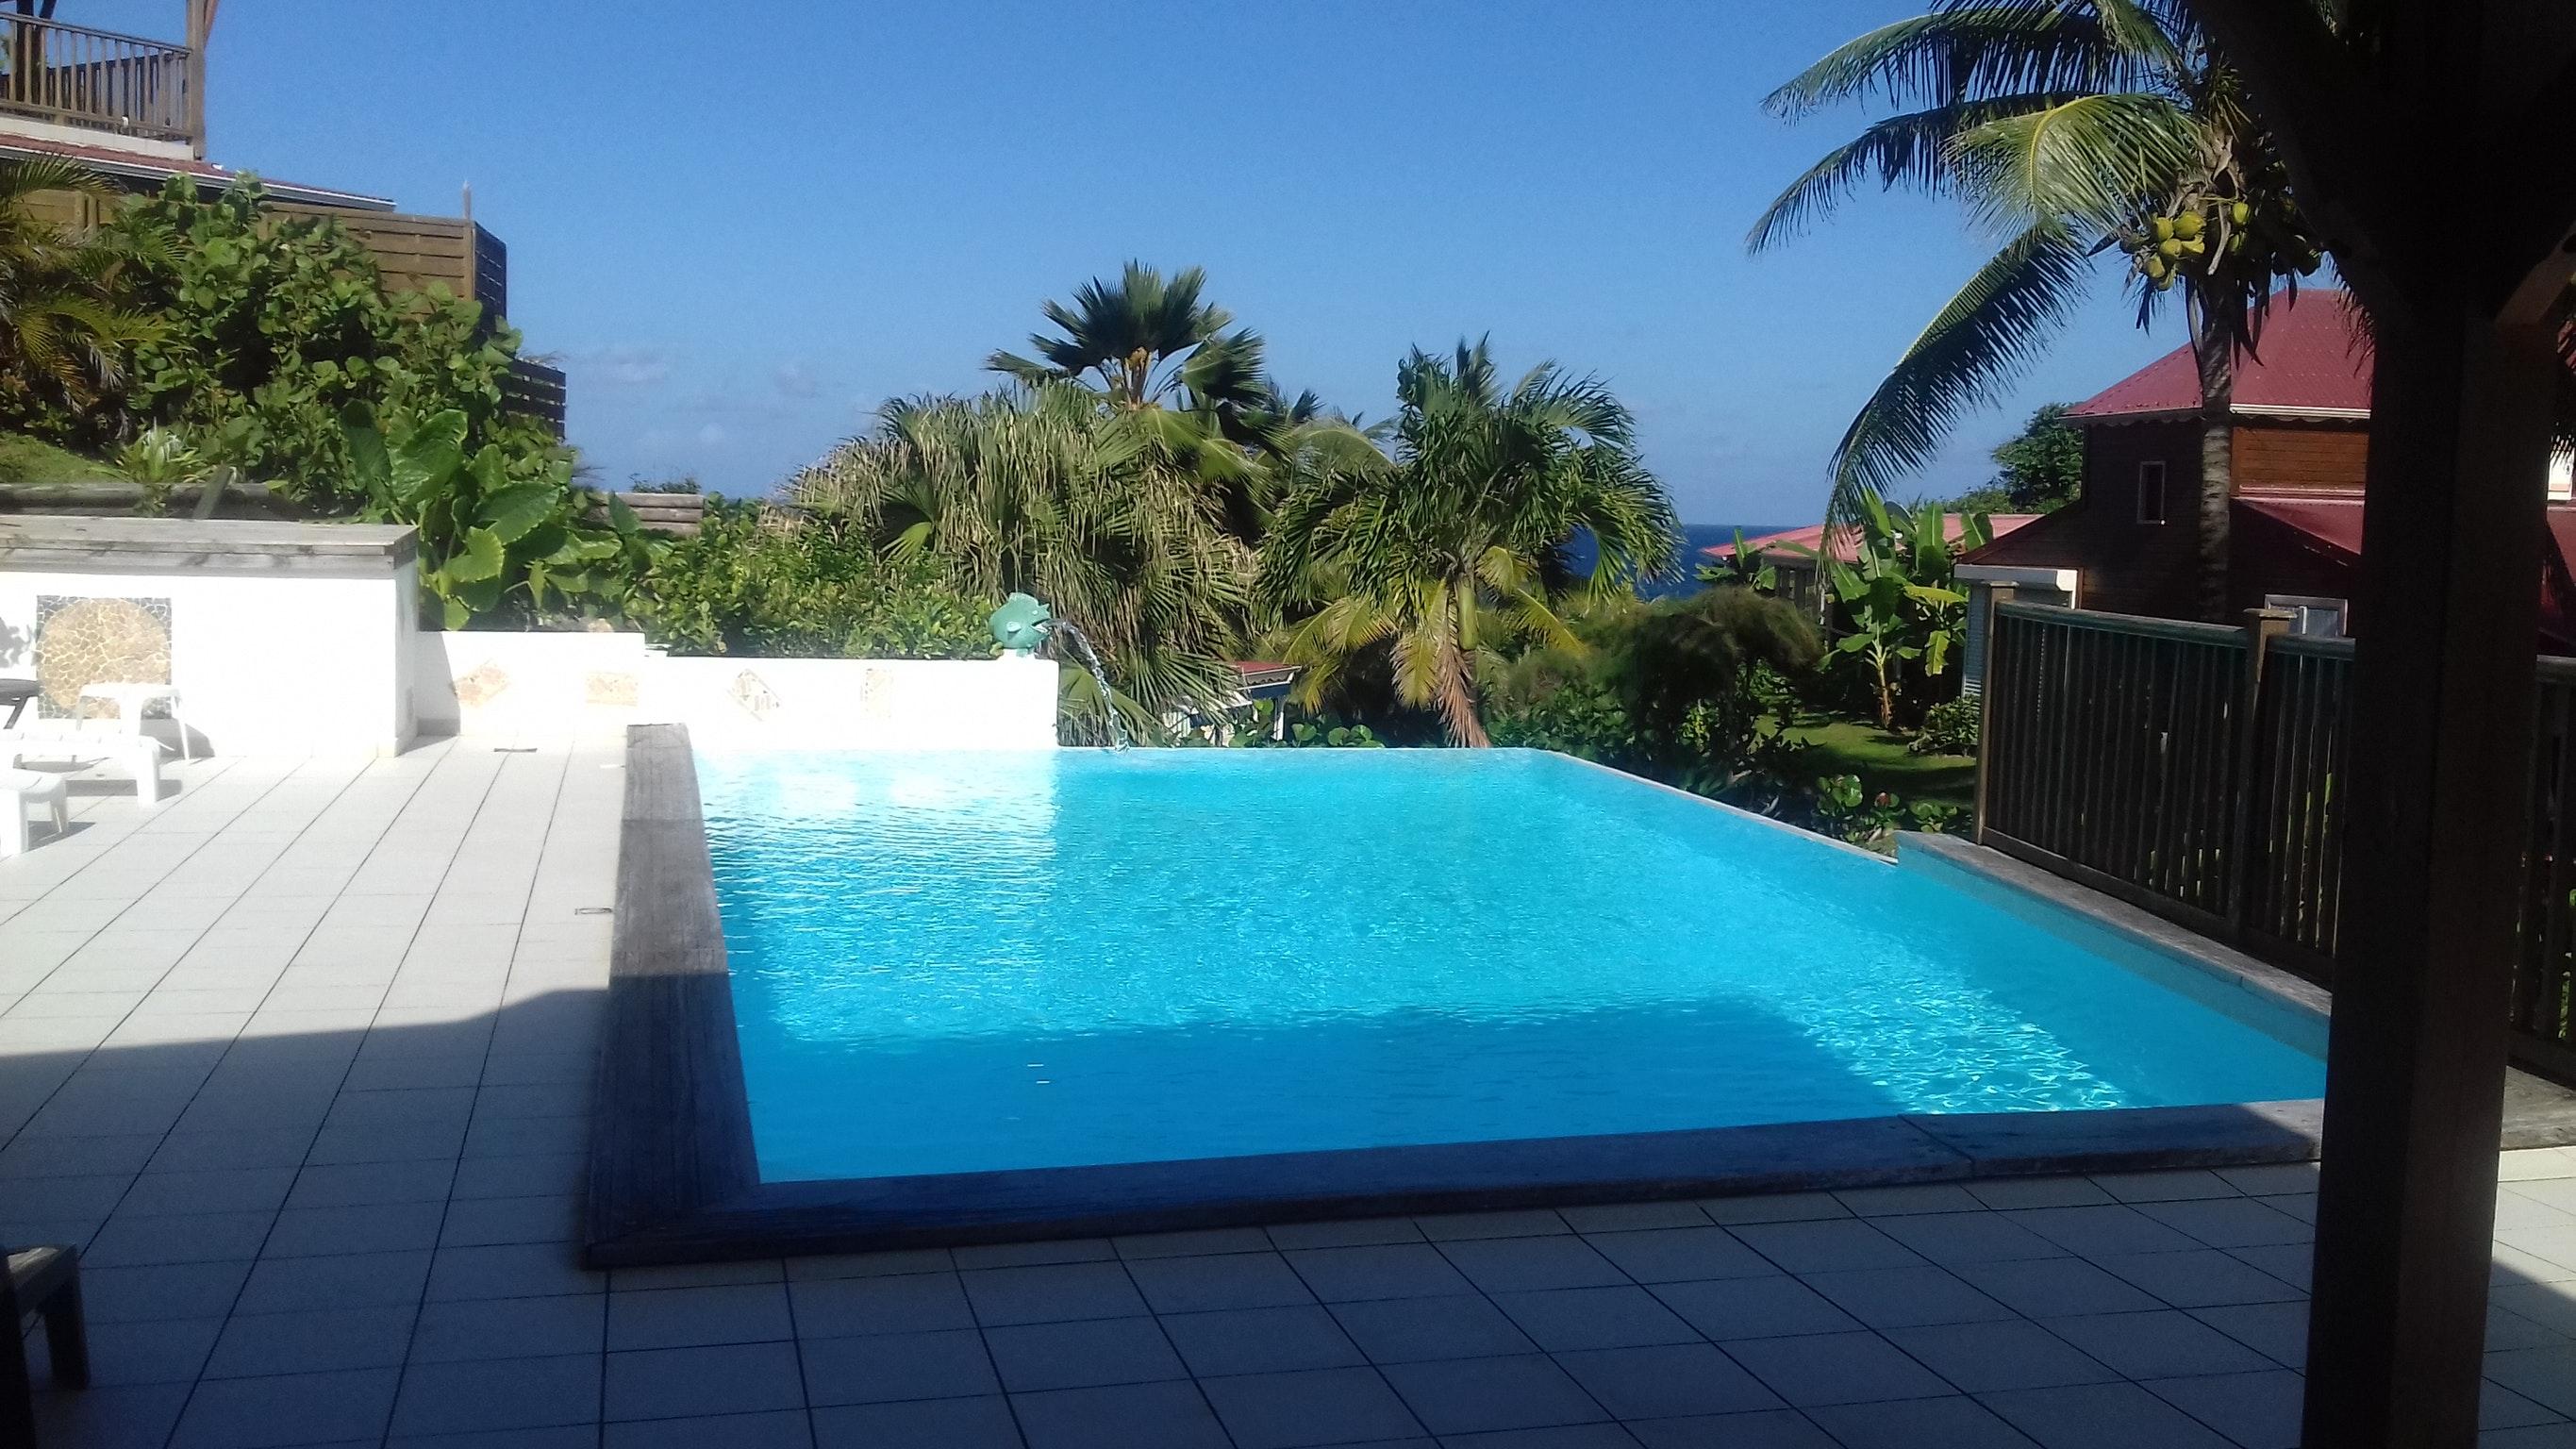 Bungalow mit 3 Schlafzimmern in Le Moule mit herrl Hütte in Guadeloupe